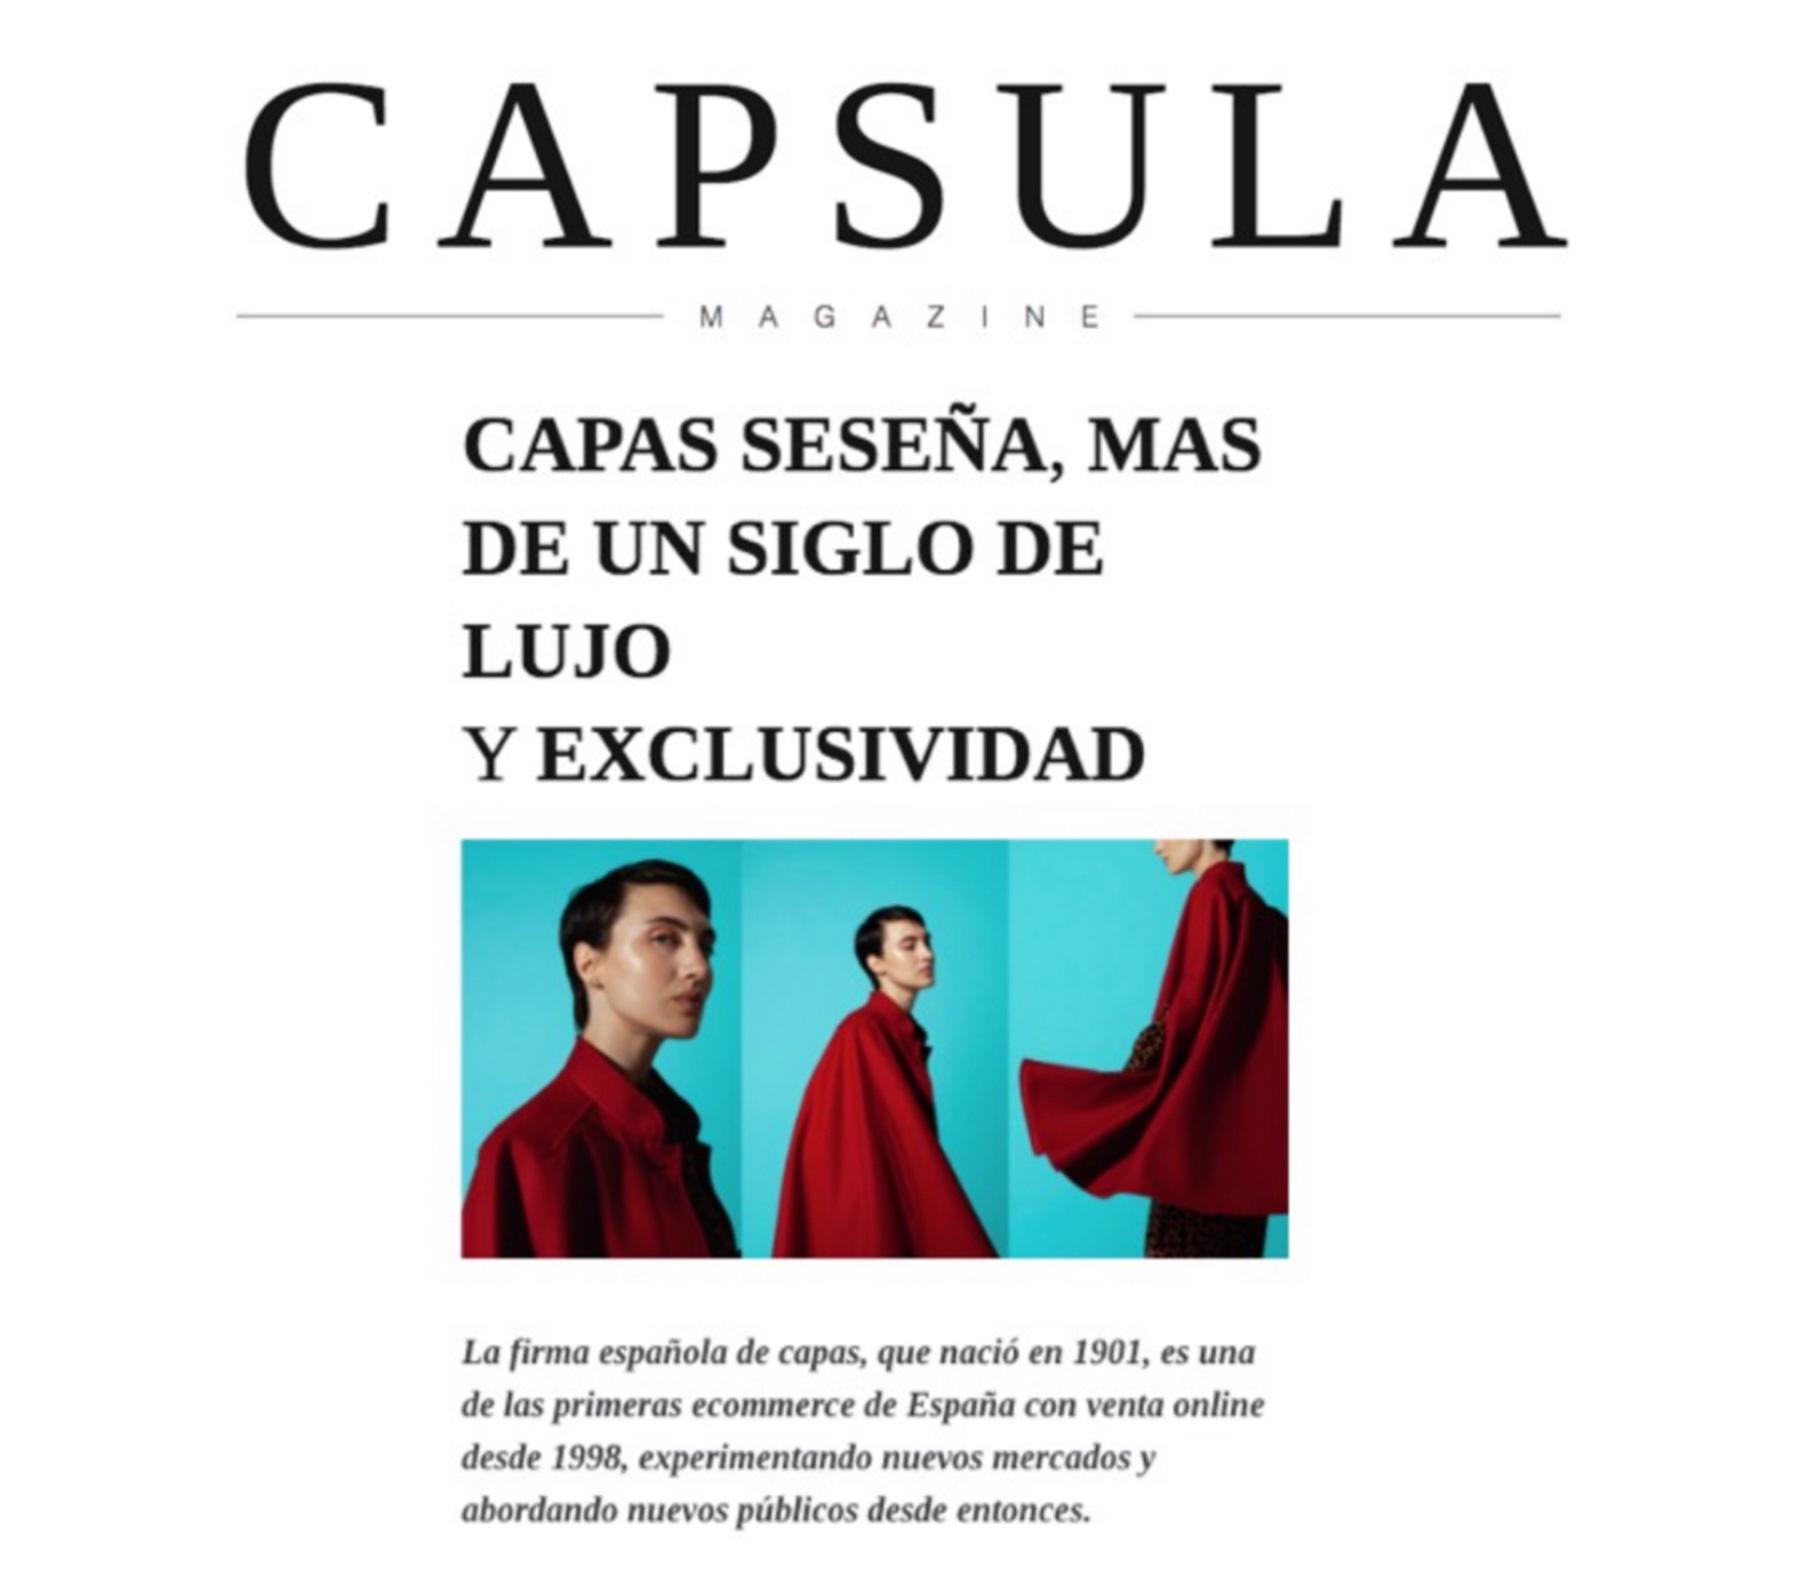 Seseña - Capsula Magazine